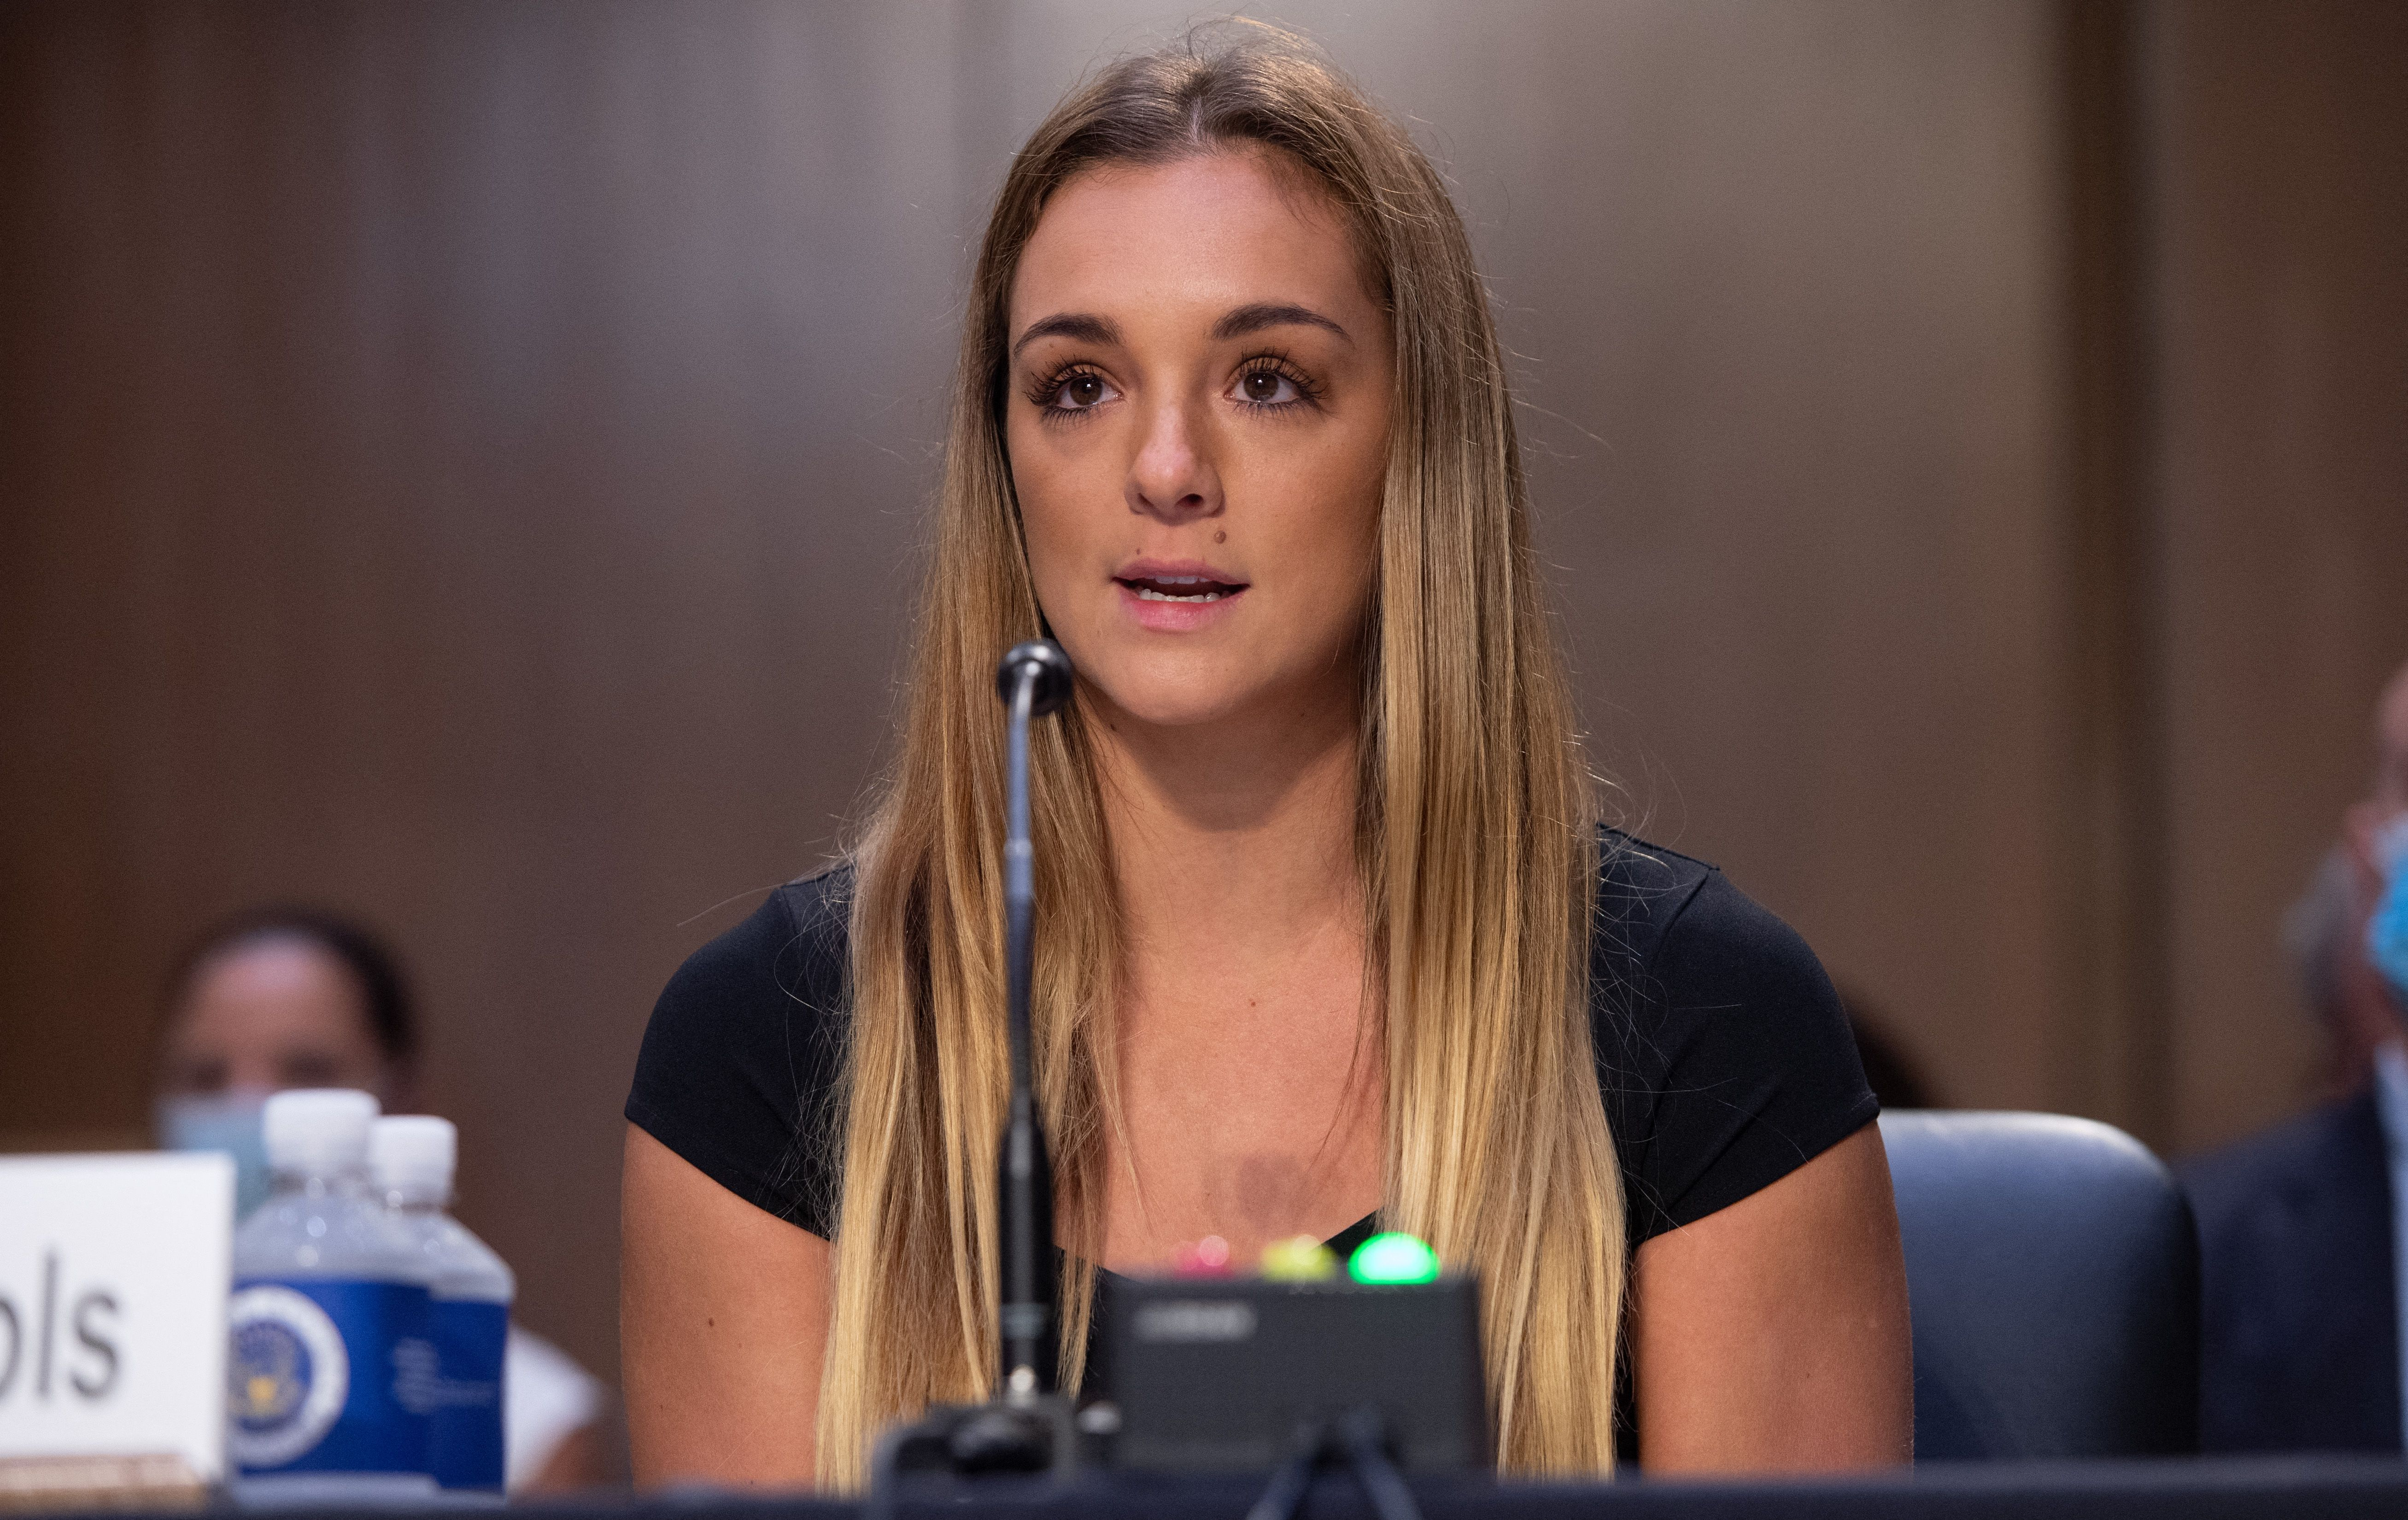 Maggie Nichols testifies during a Senate Judiciary hearing